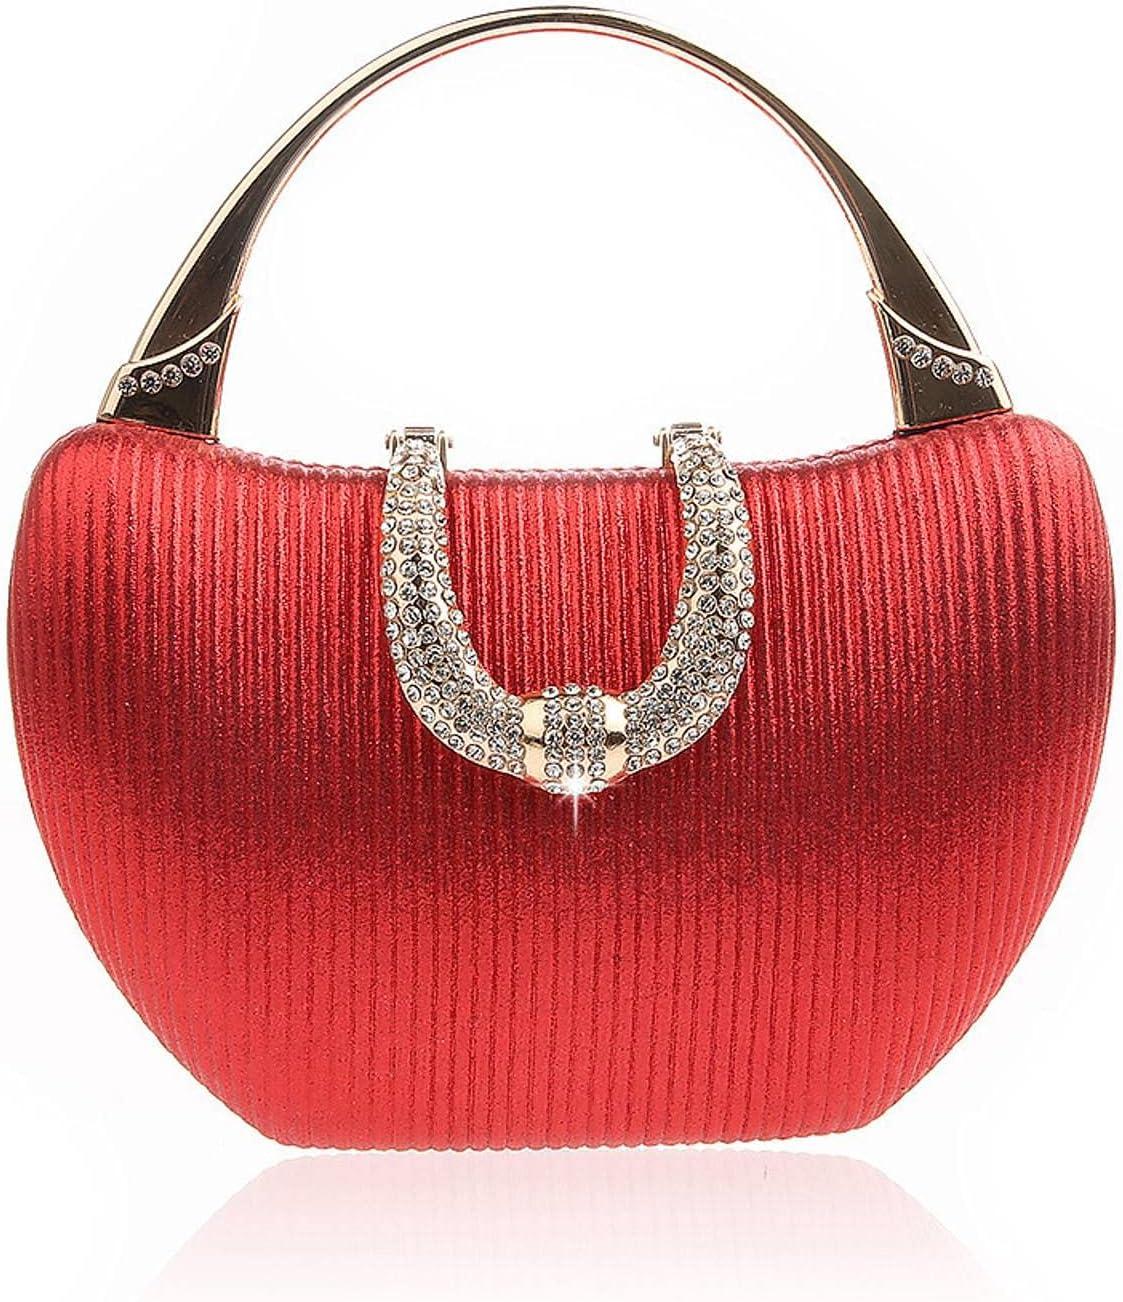 NC Sequined Mobile Phone Bag Sweet Lady Fashion Female Bag Portable Dinner Bag